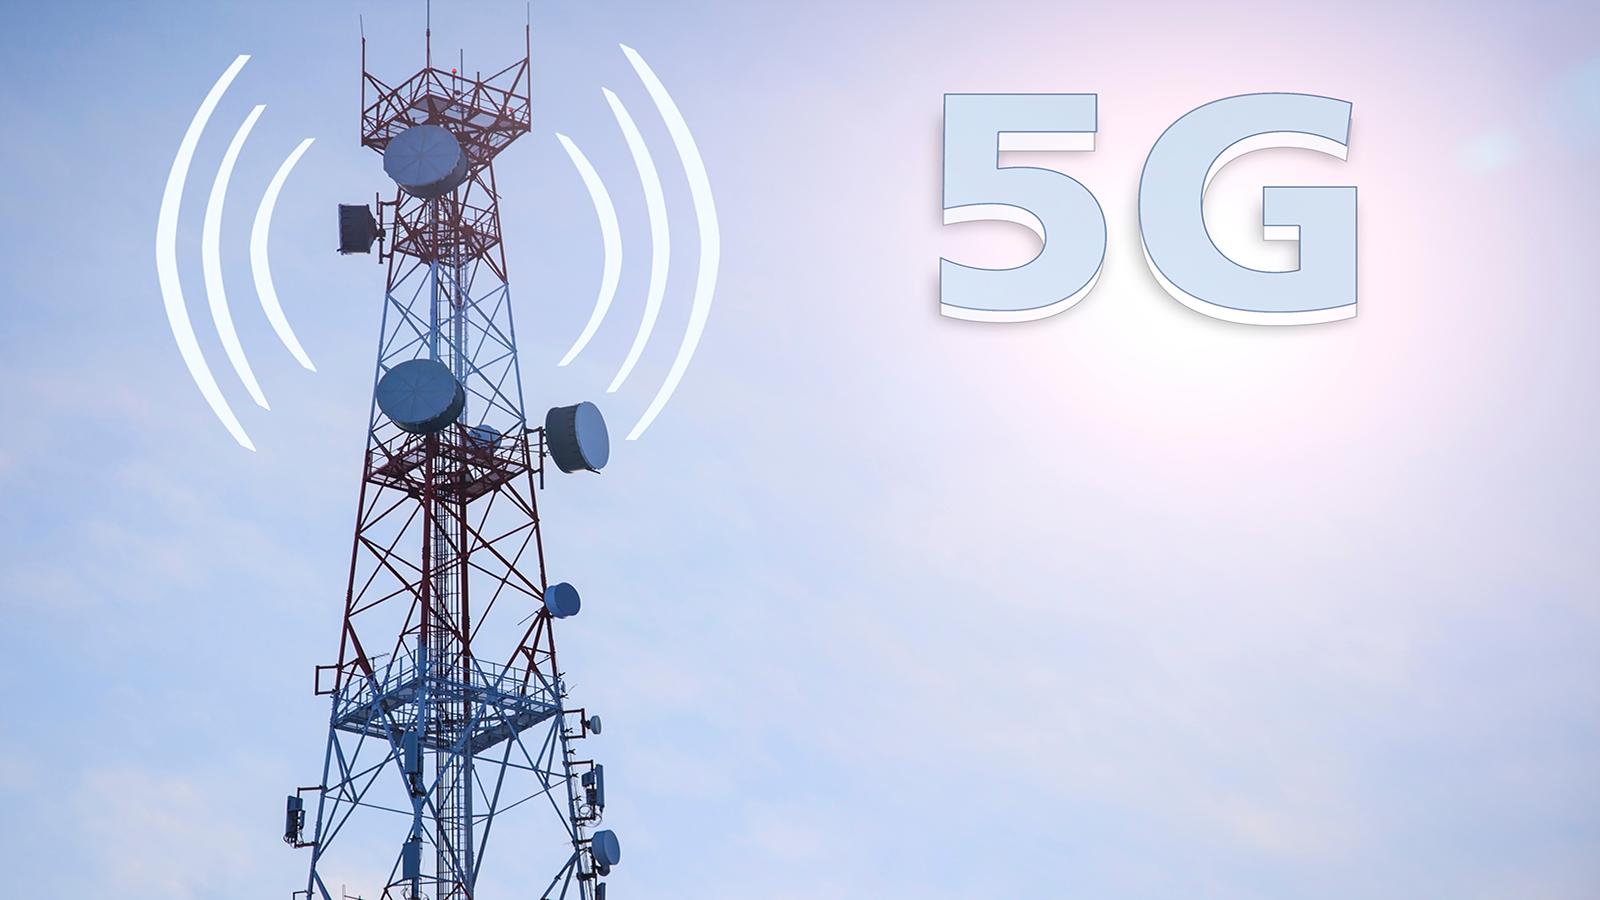 20G Network Equipment Manufacturers   Keysight